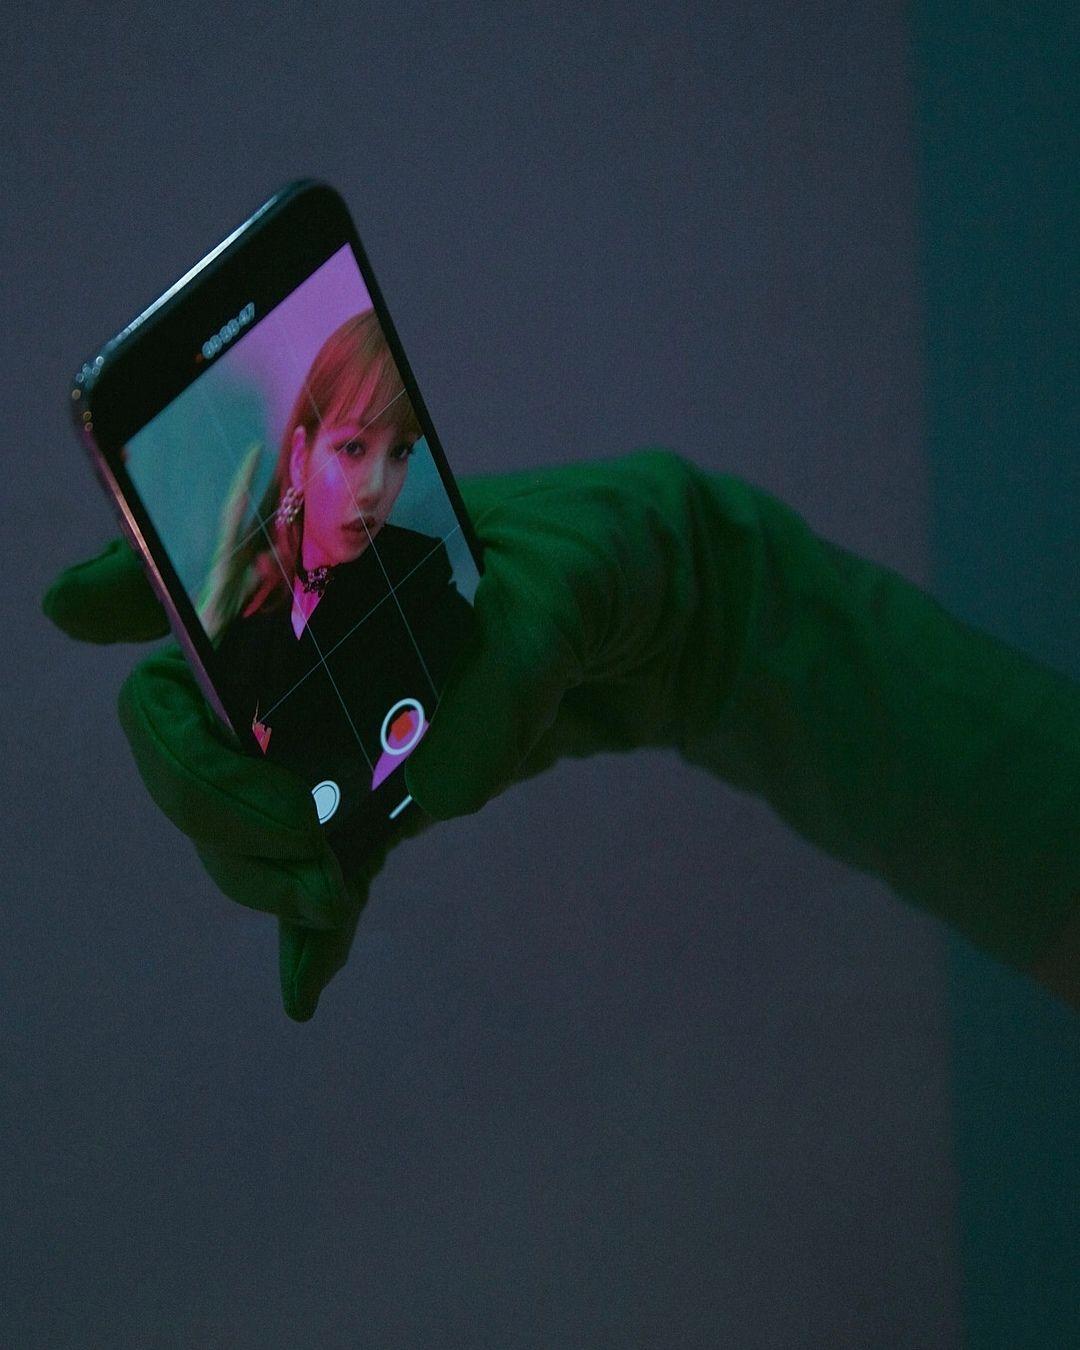 BLACKPINK YG BLΛƆKPIИK นางฟ้า, คนดัง, ภาพ